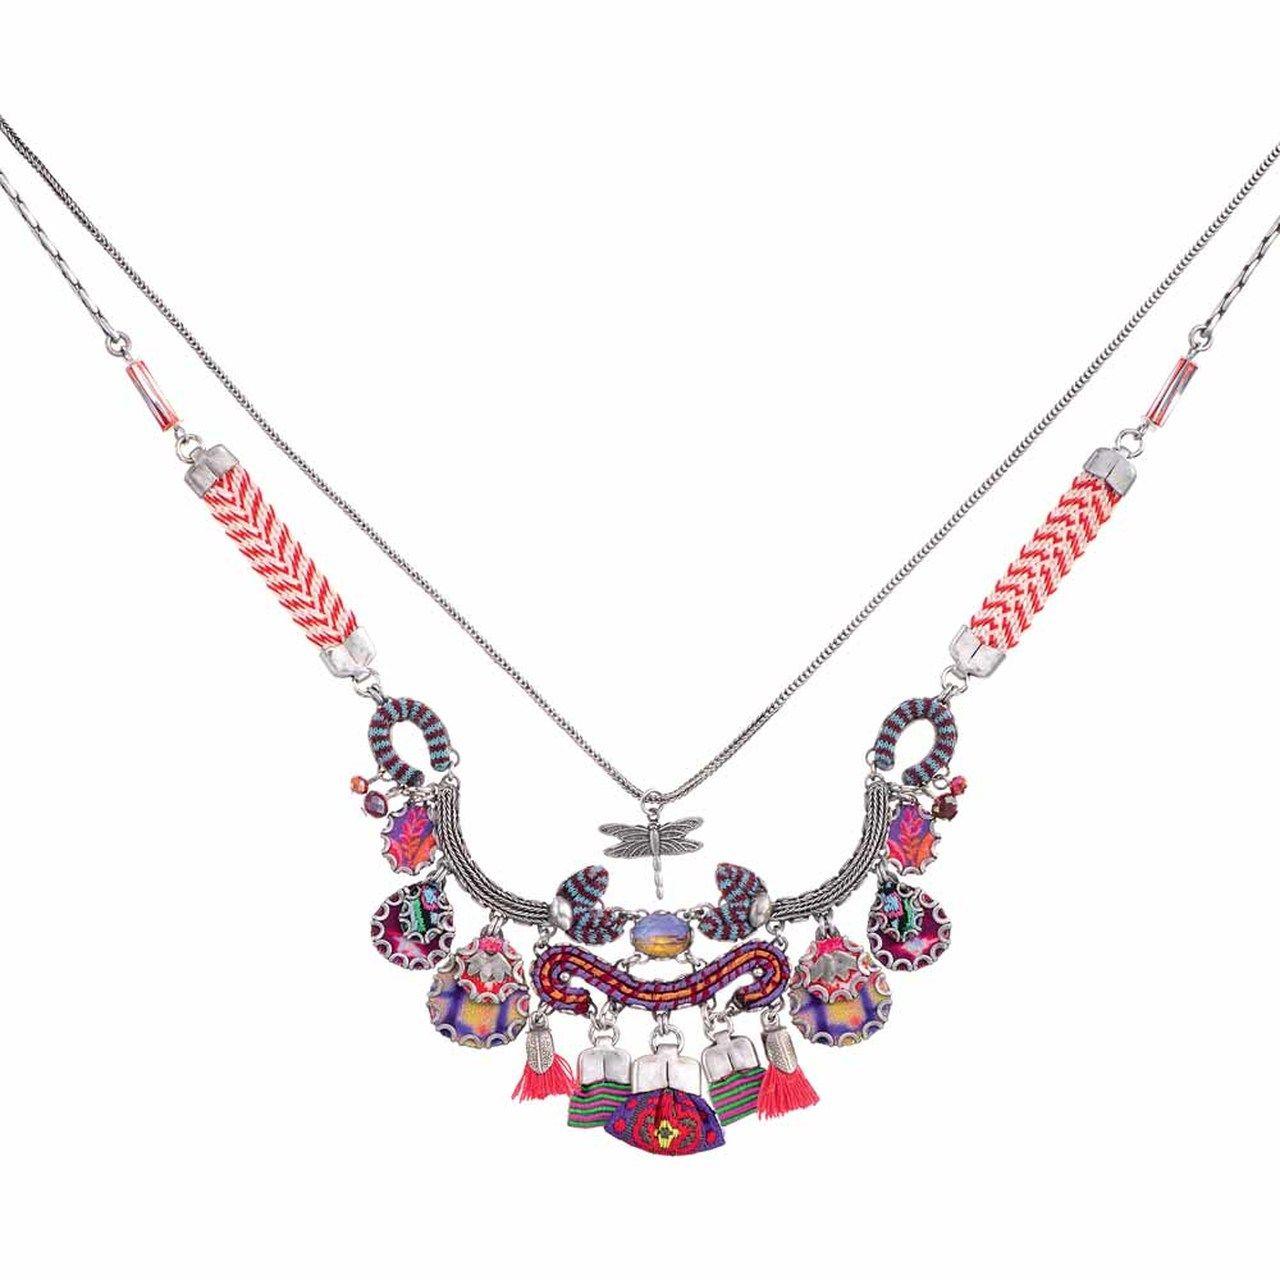 Ayala Bar Ruby Tuesday Mars Necklace Bar Jewelry Ruby Tuesdays Bar Necklace